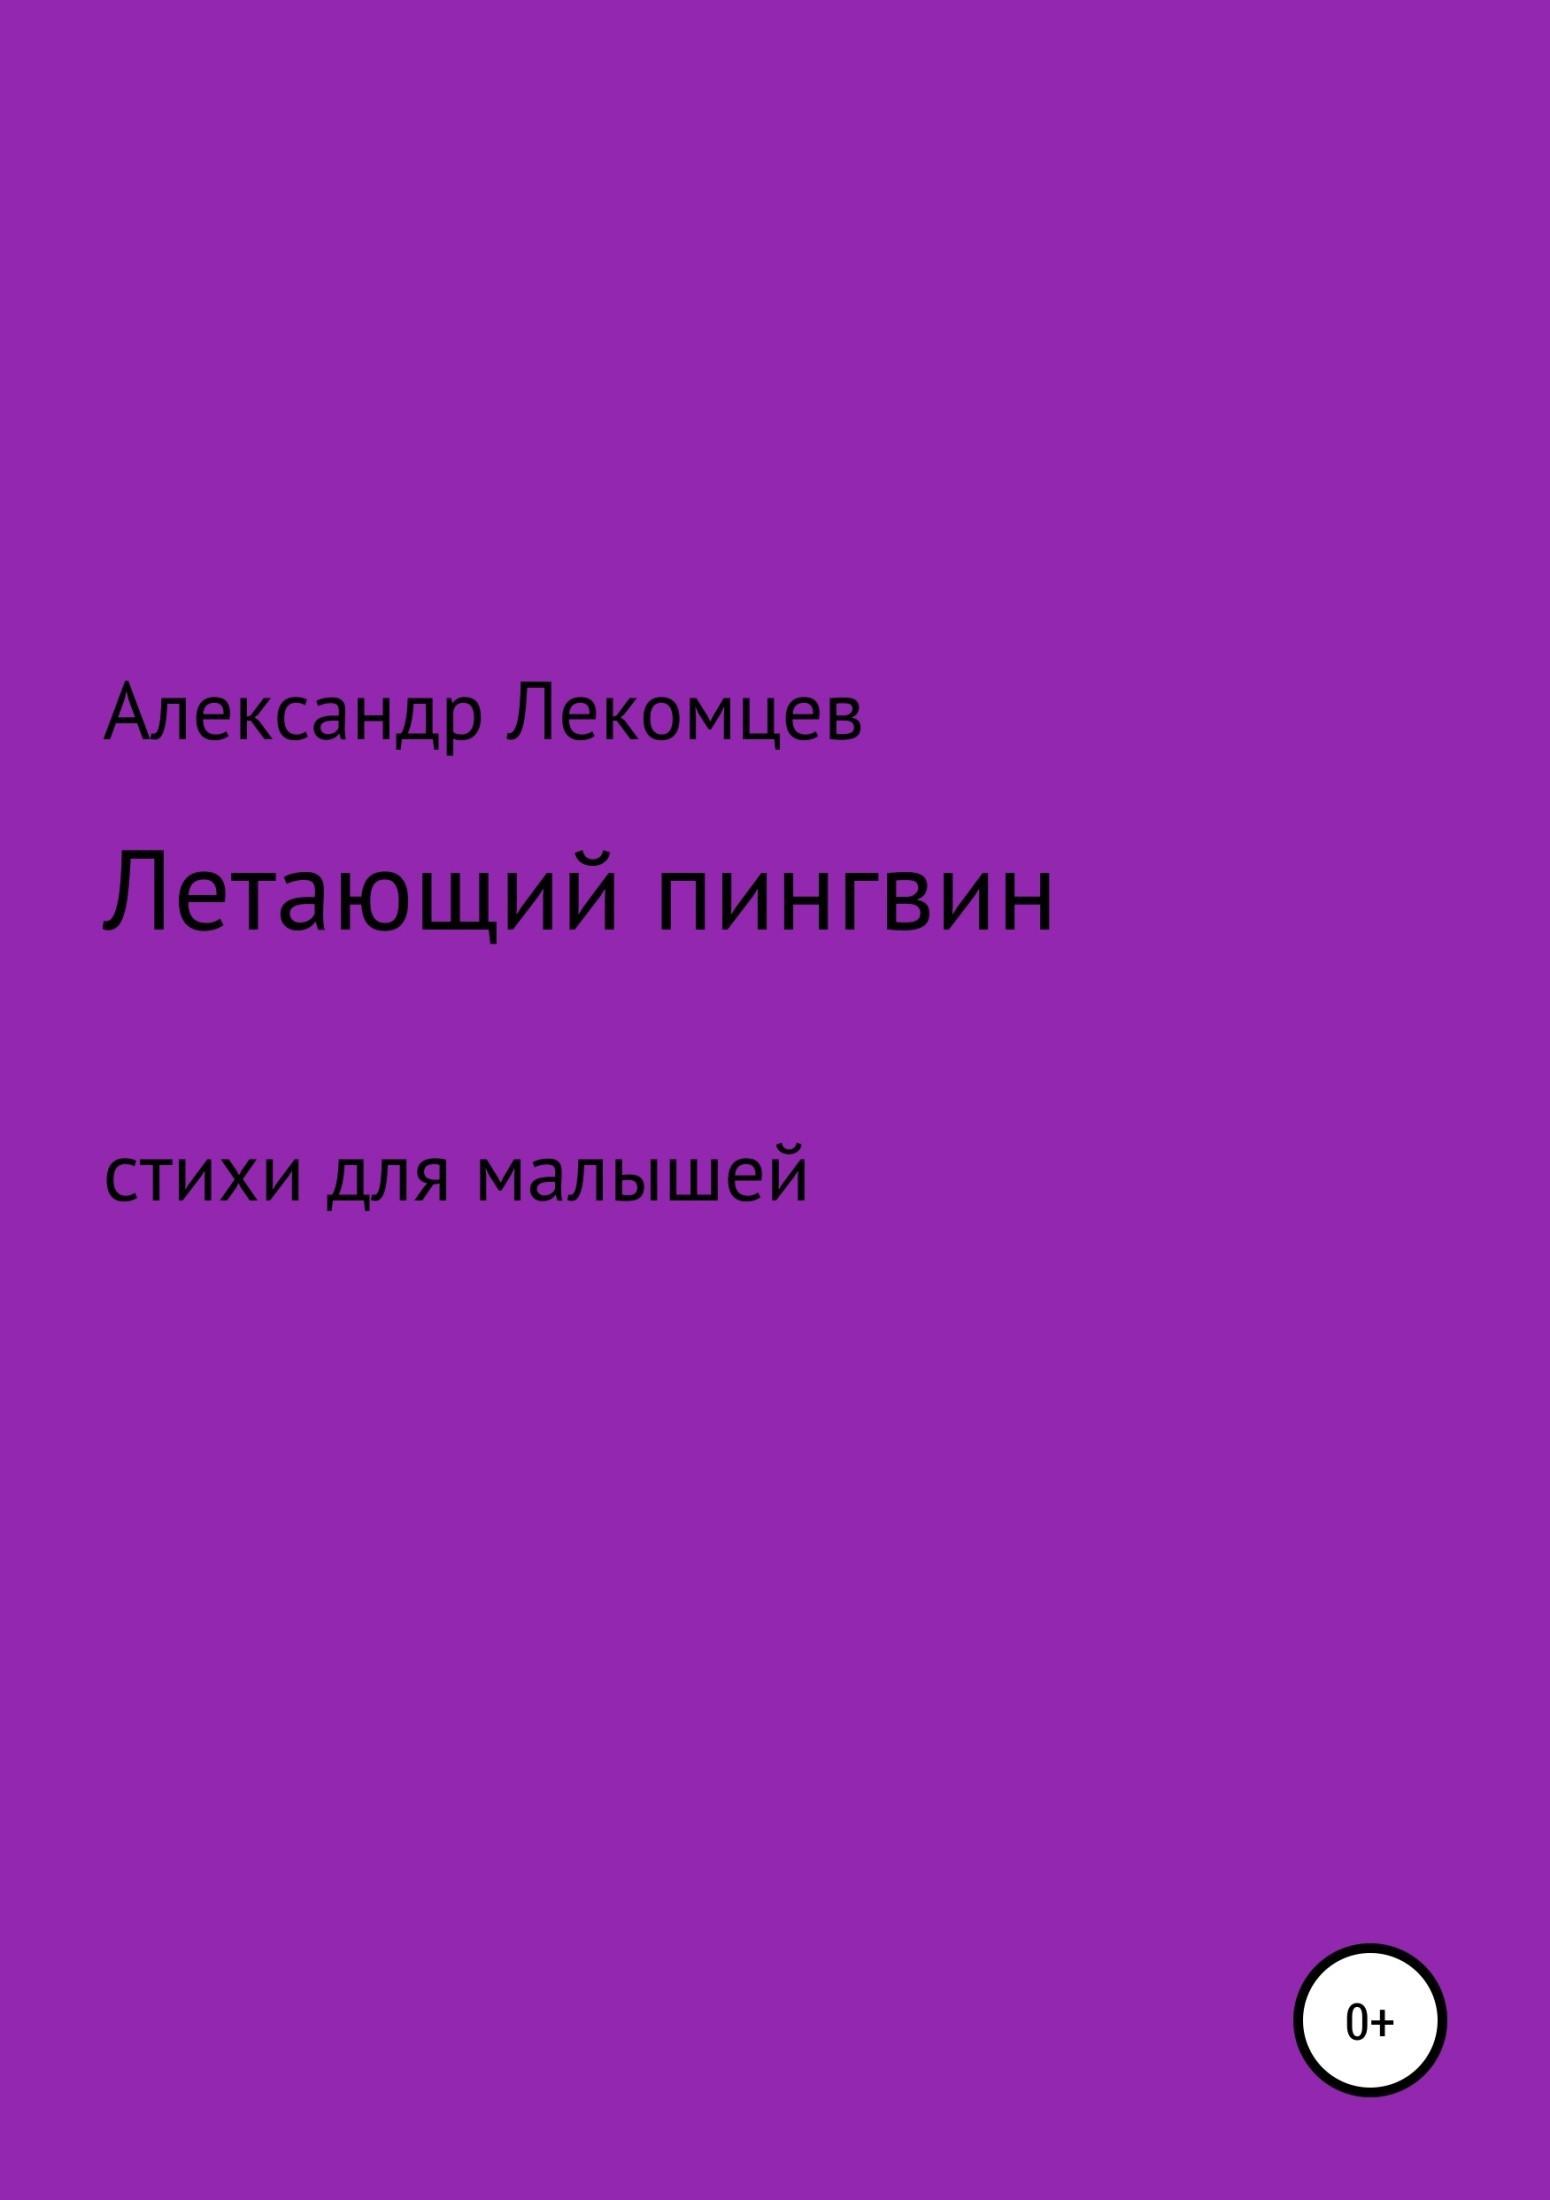 Александр Лекомцев - Летающий пингвин